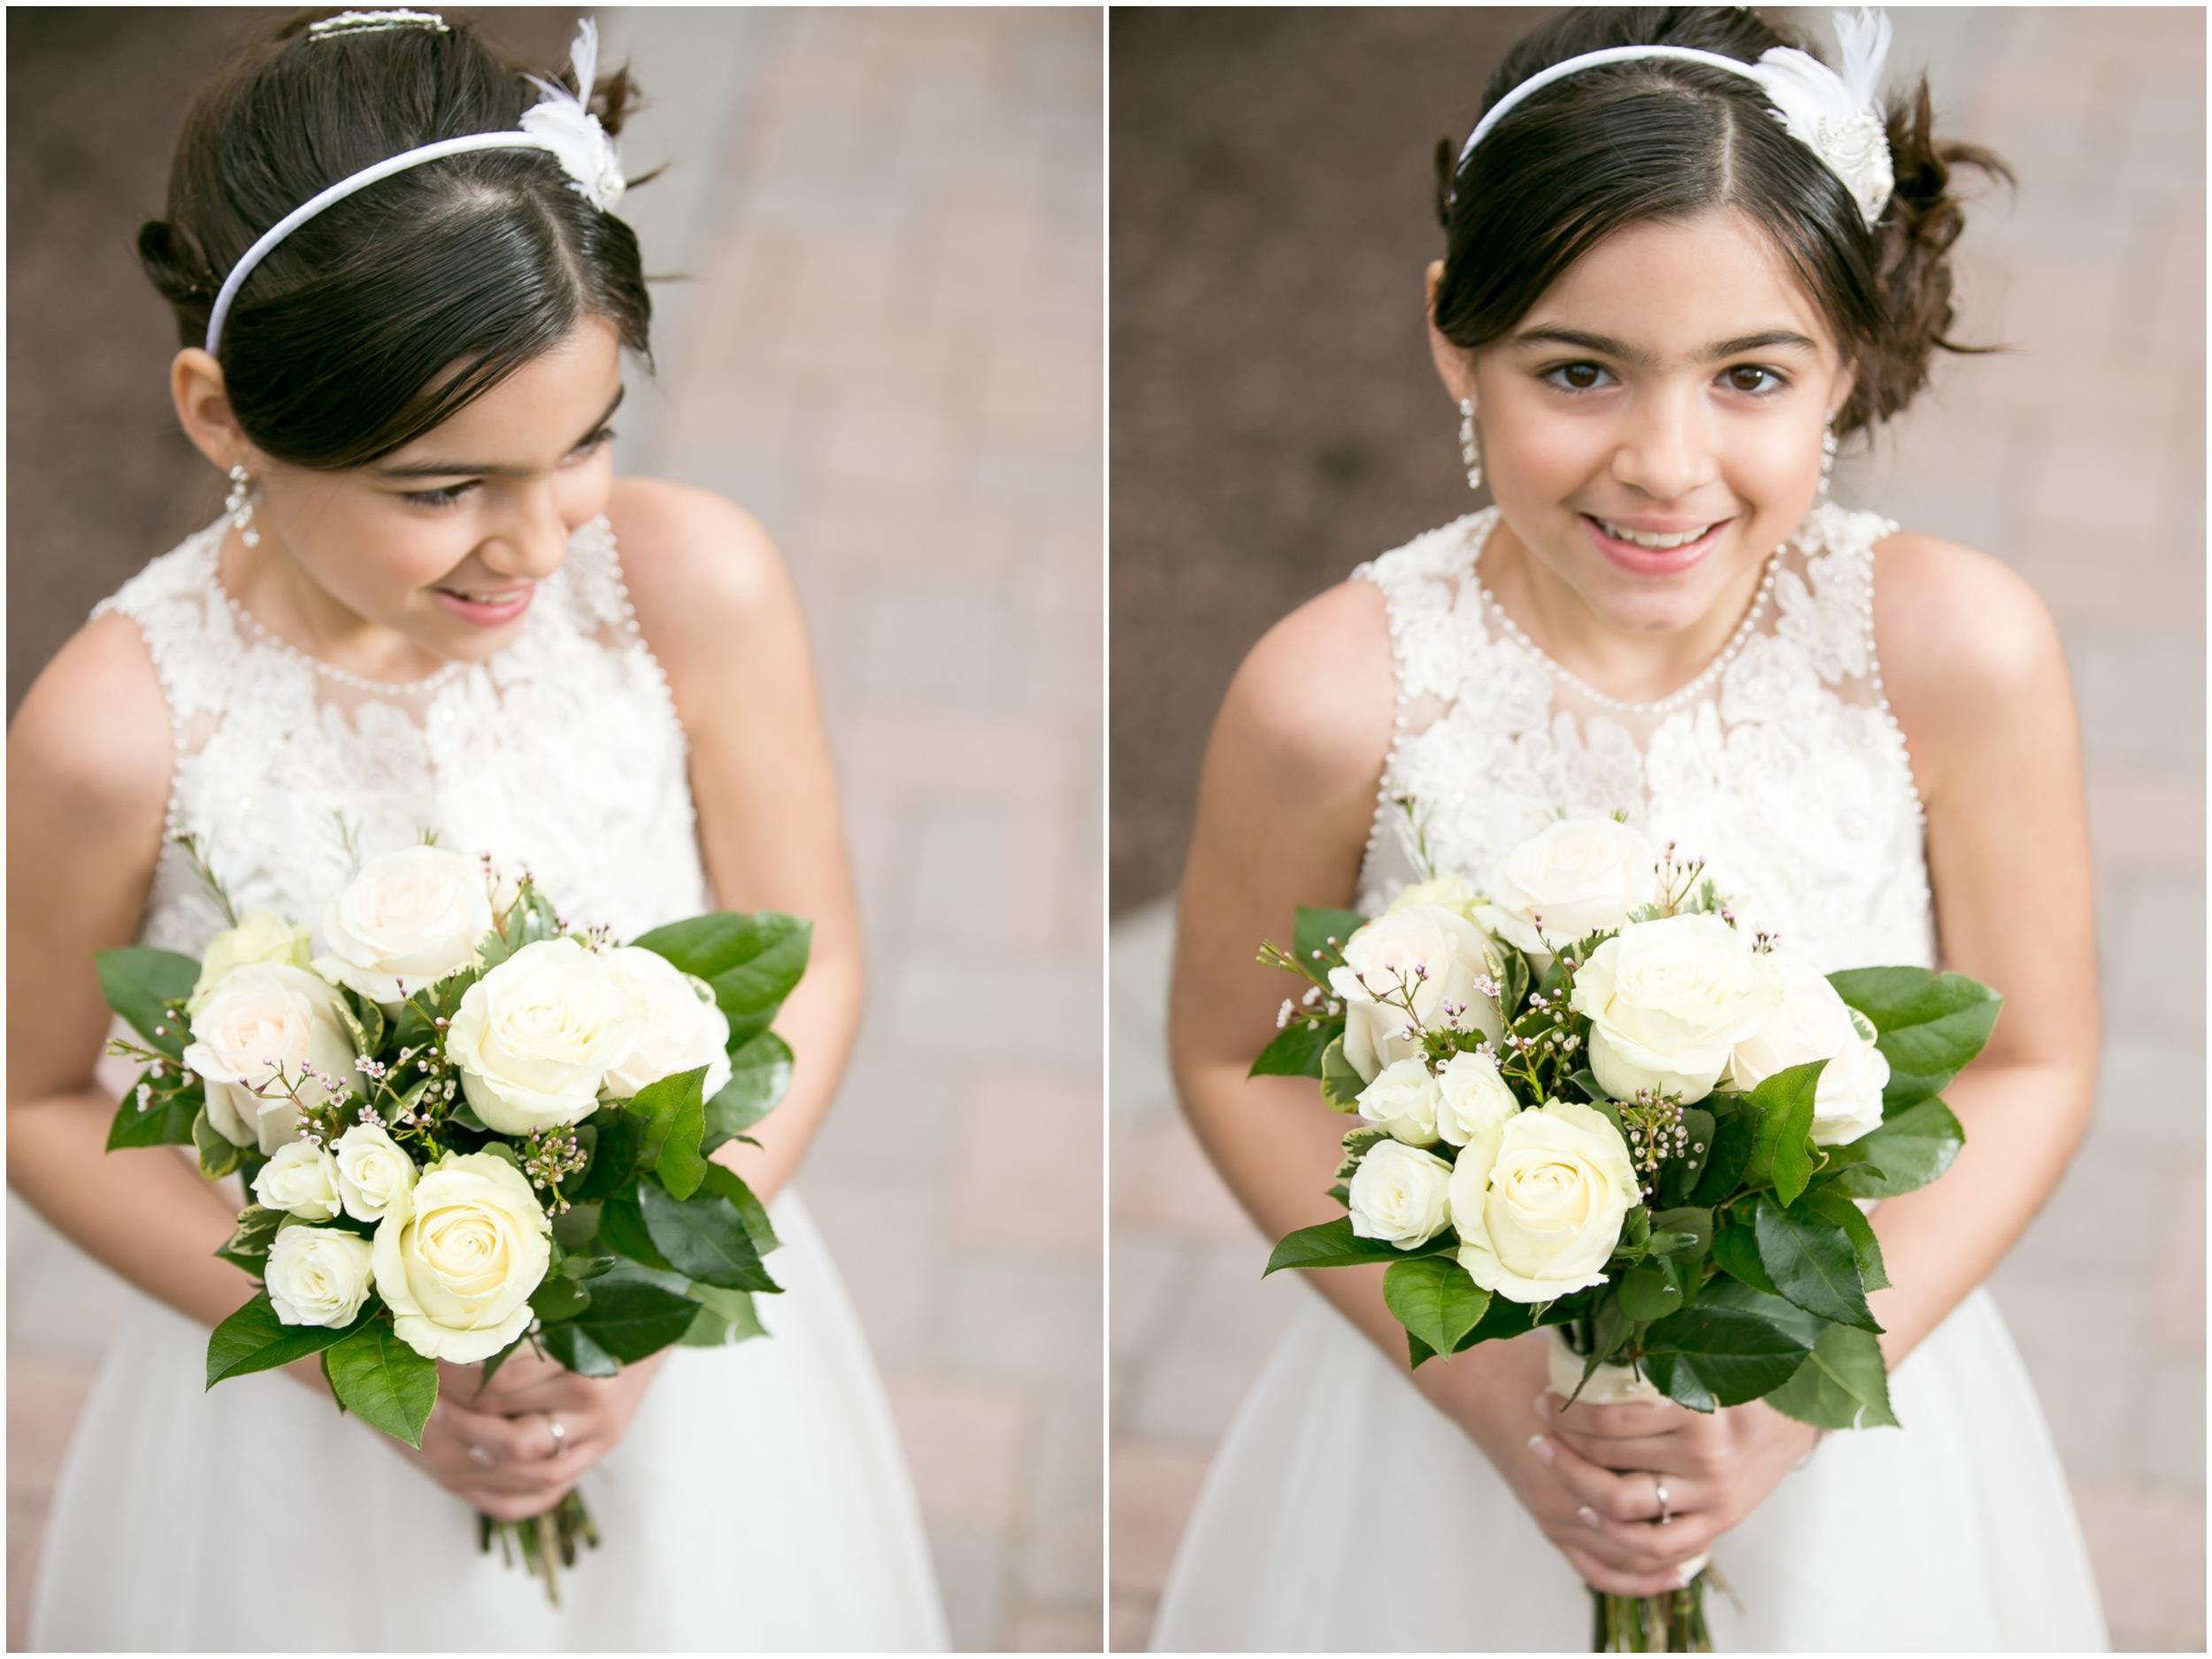 Bradly-and-Jesenia-Wedding-Collage-18.jpg